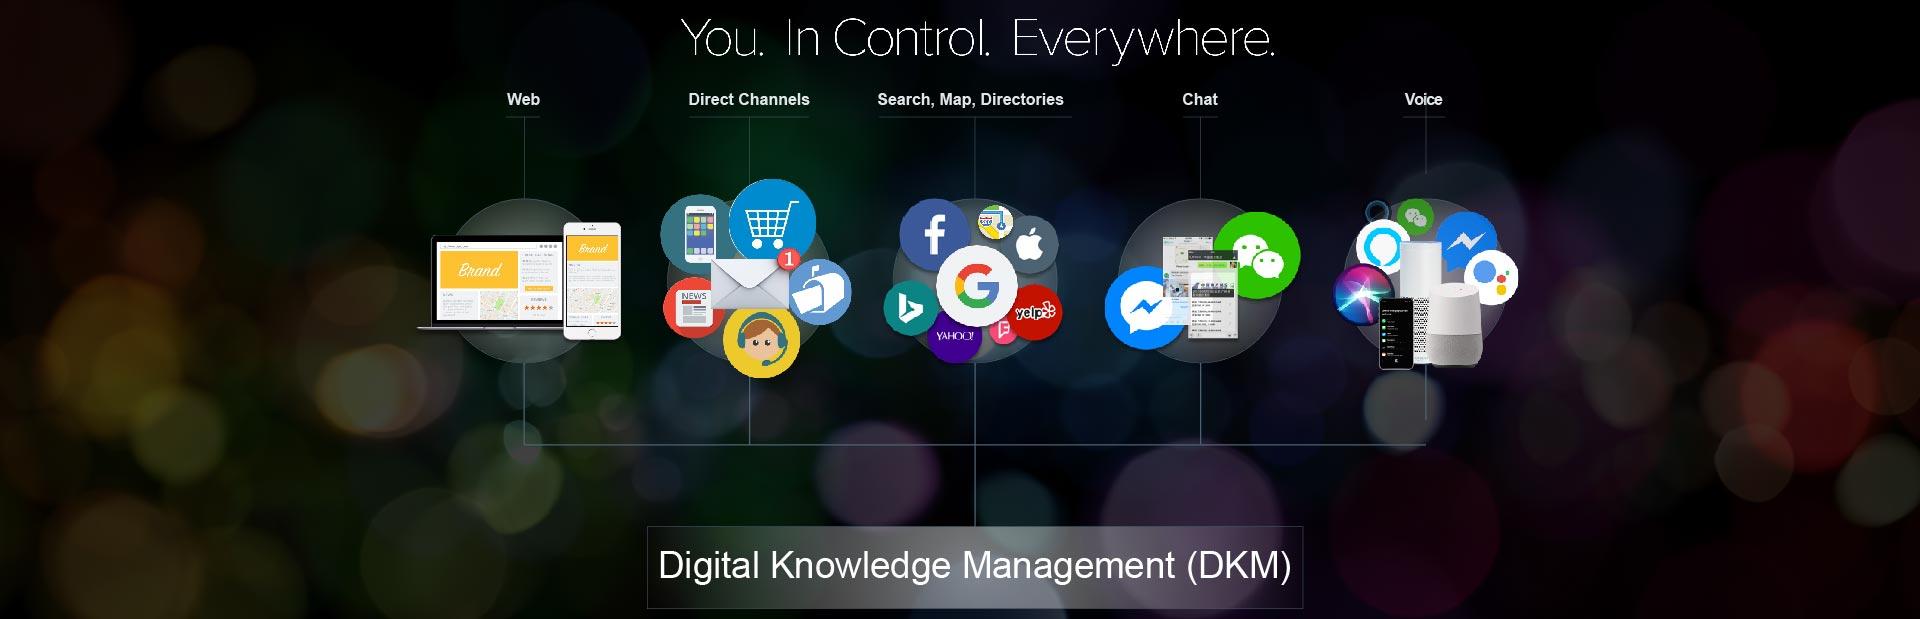 Digital Knowledge Management Banner-01